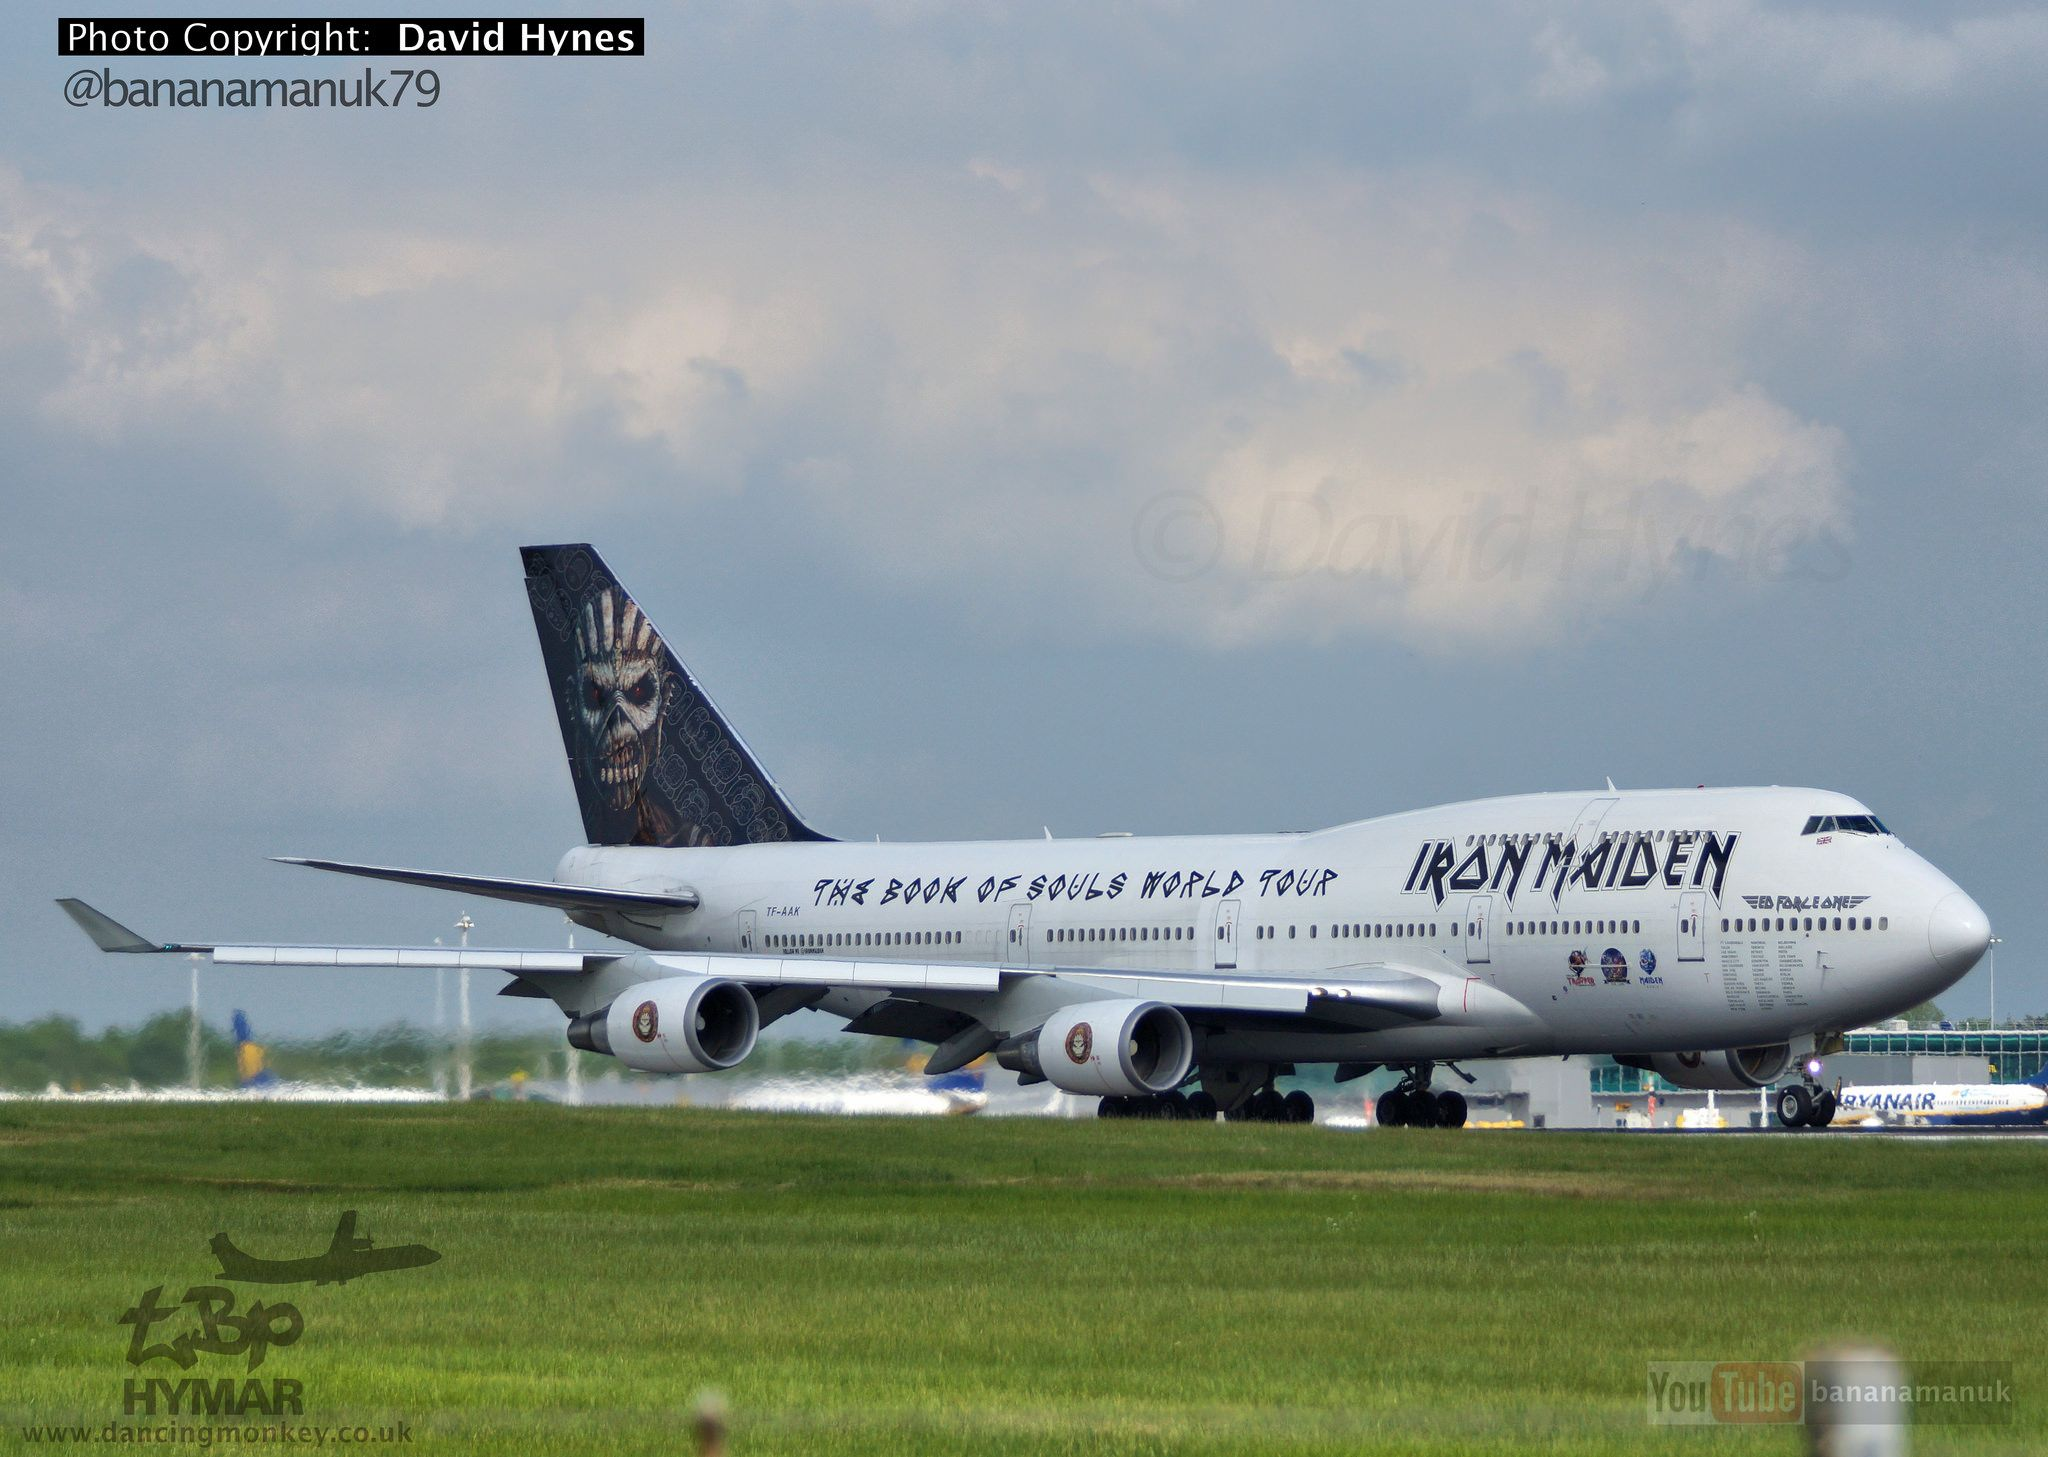 Iron Maiden Tf Aak Departing London Stansted Airport Air Atlanta Icelandic Tf Aak Air Atlanta Icelandic London Stansted Airport Iron Maiden